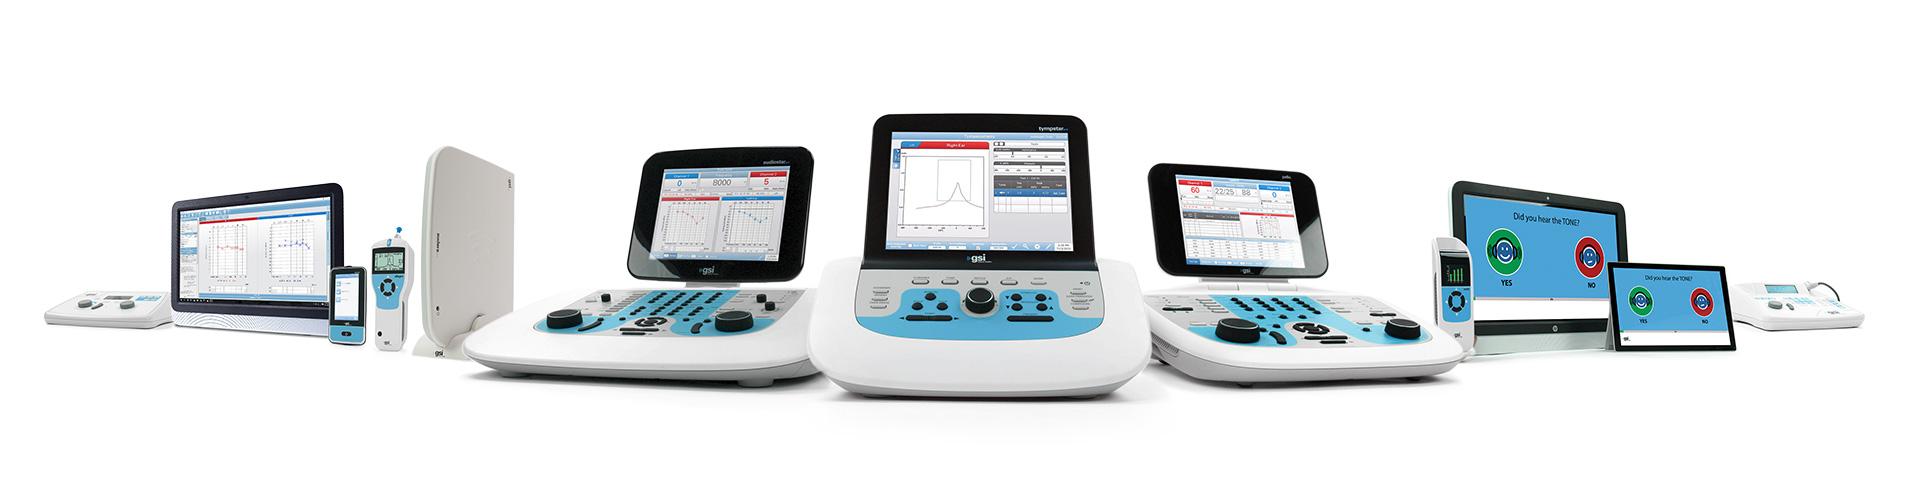 Akustik immitansmetri testleri ne zaman uygulanmalı?